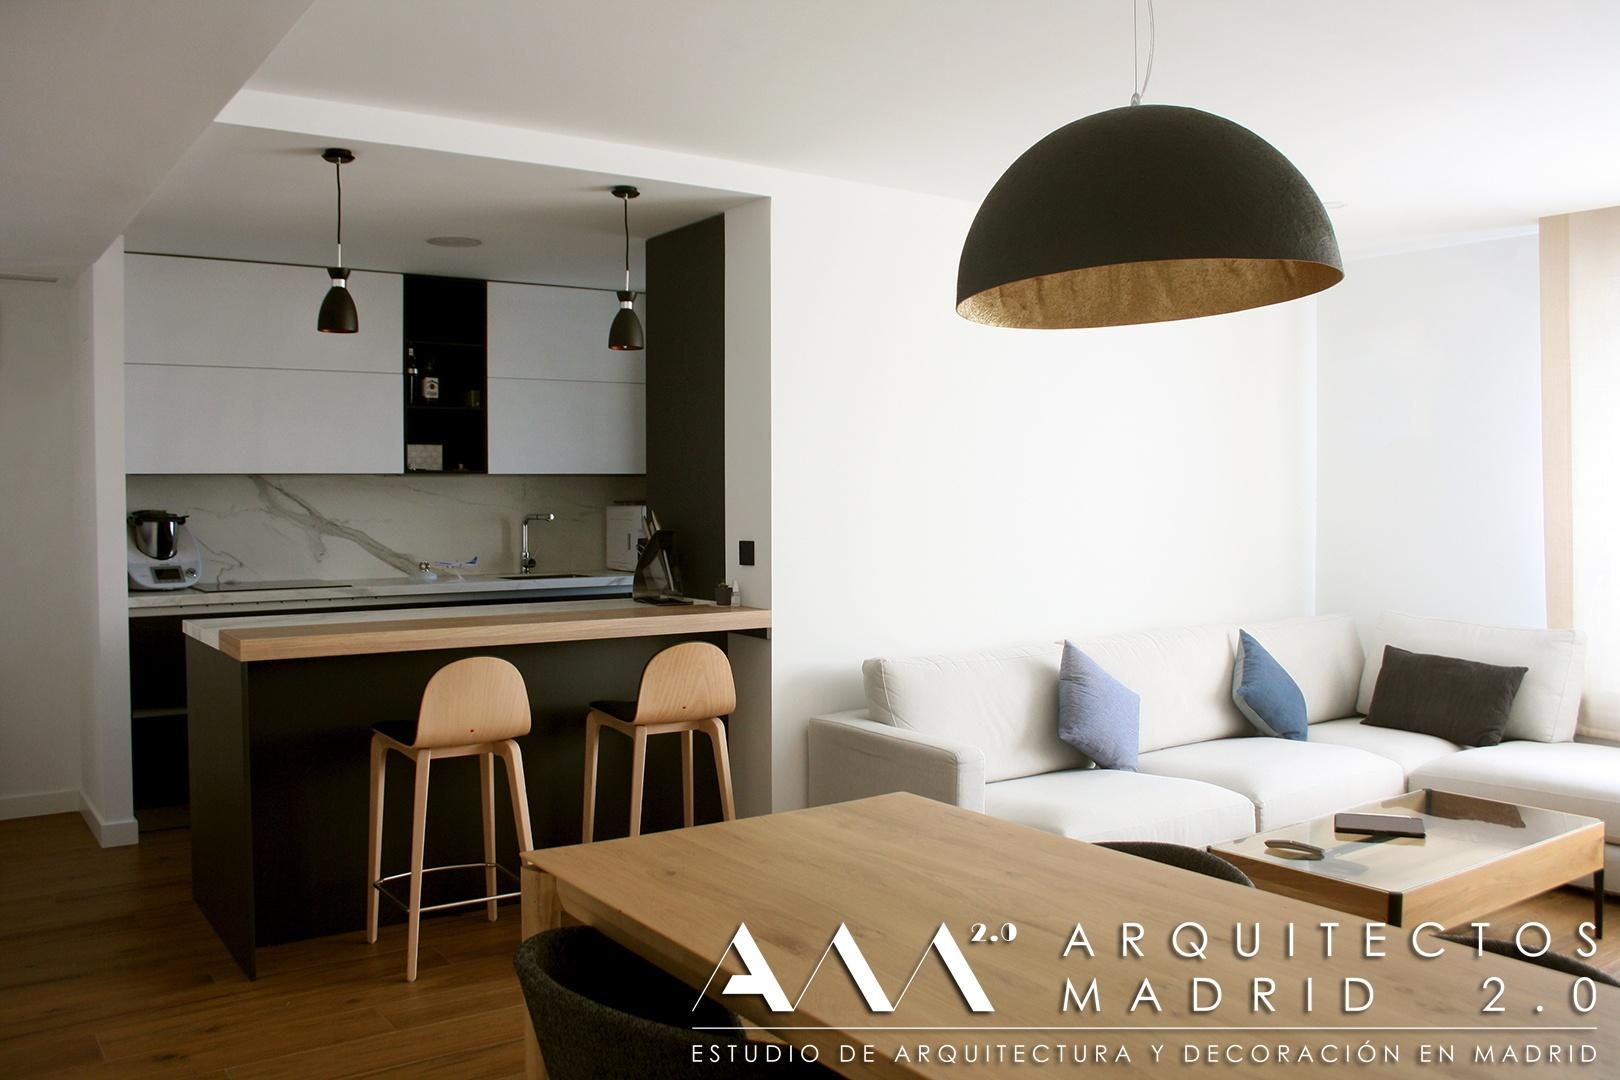 reformas-integrales-madrid-reforma-apartmento-atico-duplex-chalet